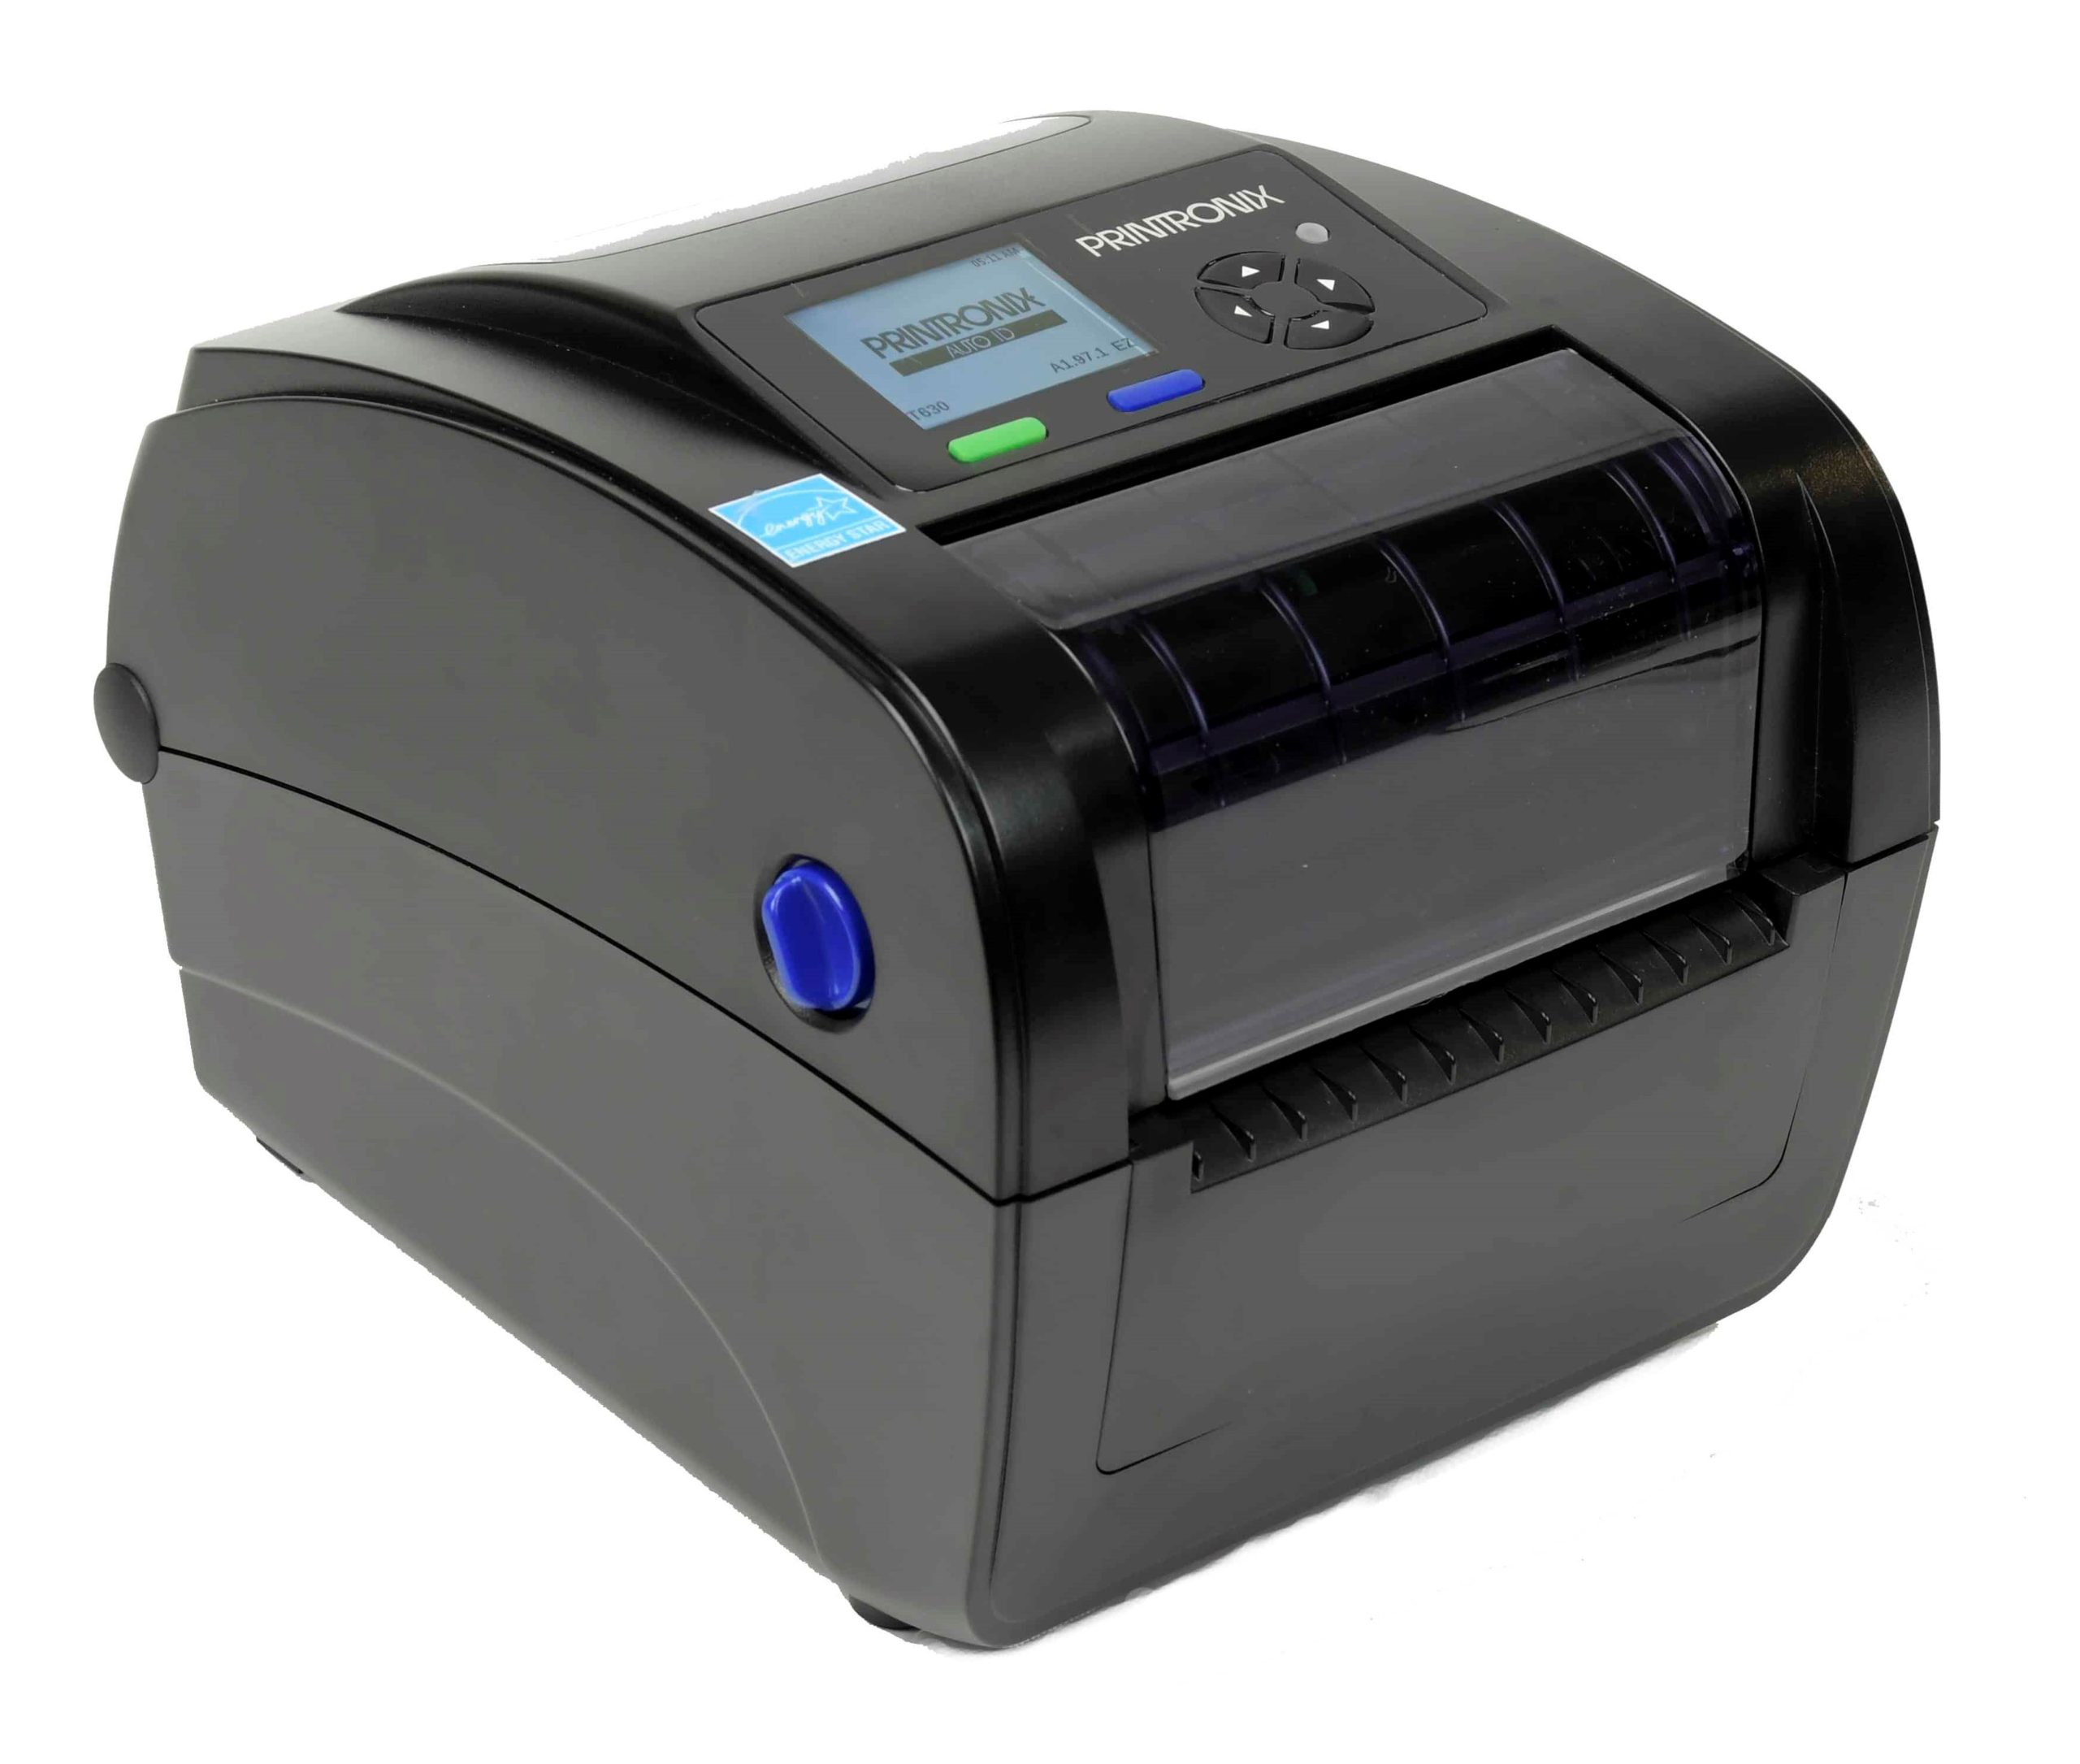 T600 Printronix Auto ID Desktop Printers